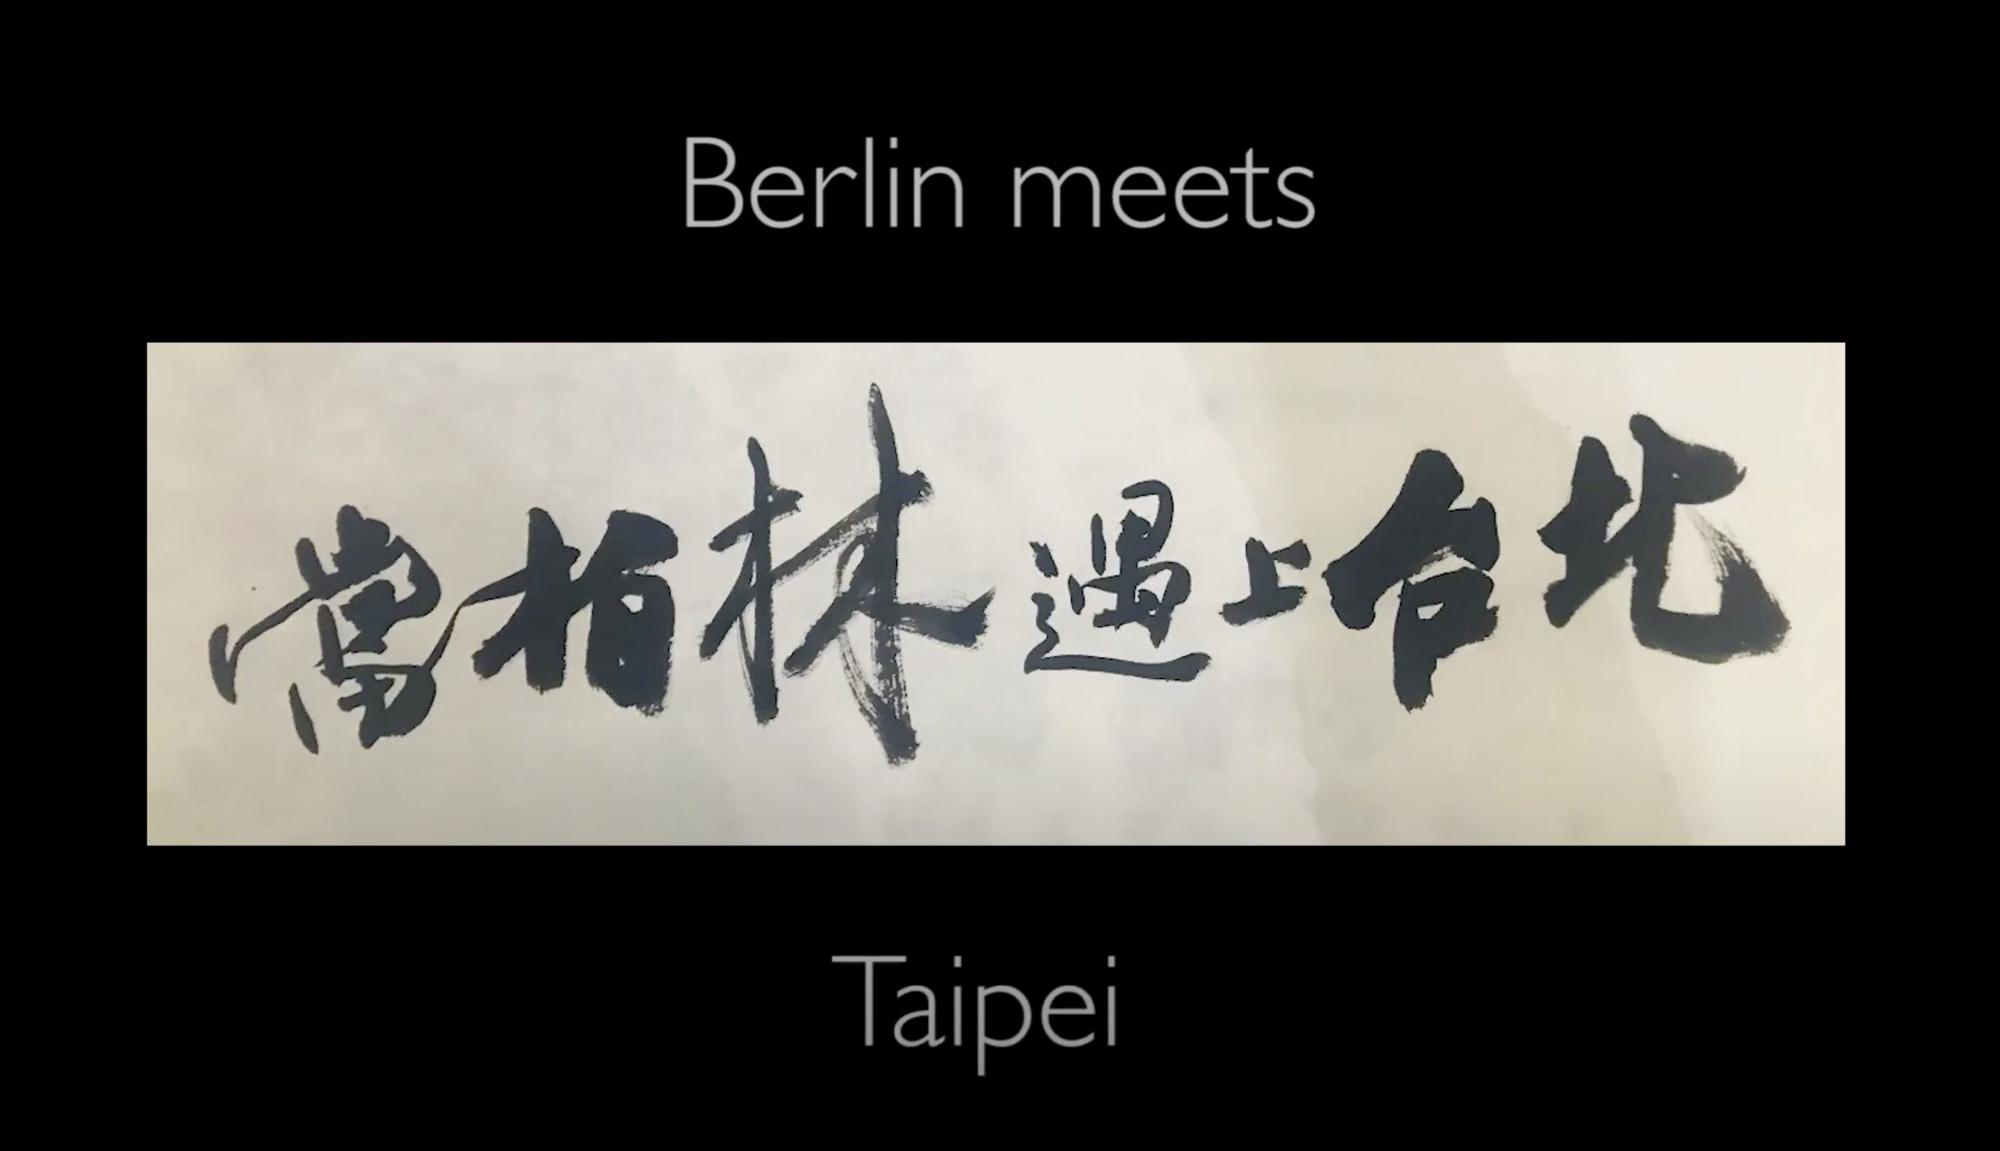 Berlin meets Taipei...